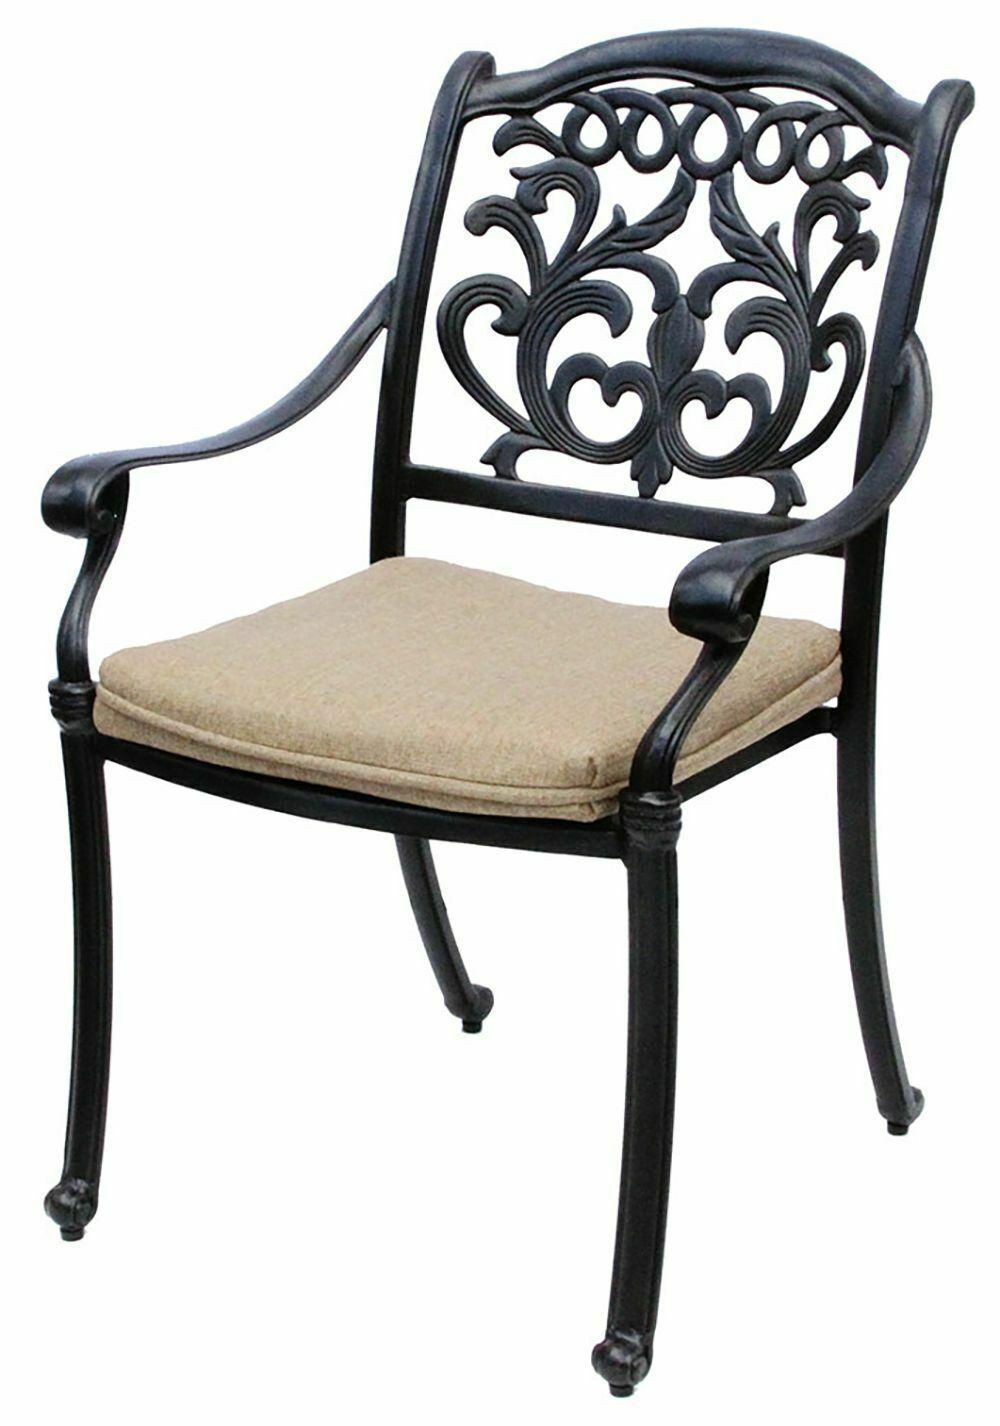 Patio dining Set 7Pc Cast Aluminum Furniture Outdoor Table Chair Flamingo Bronze image 2